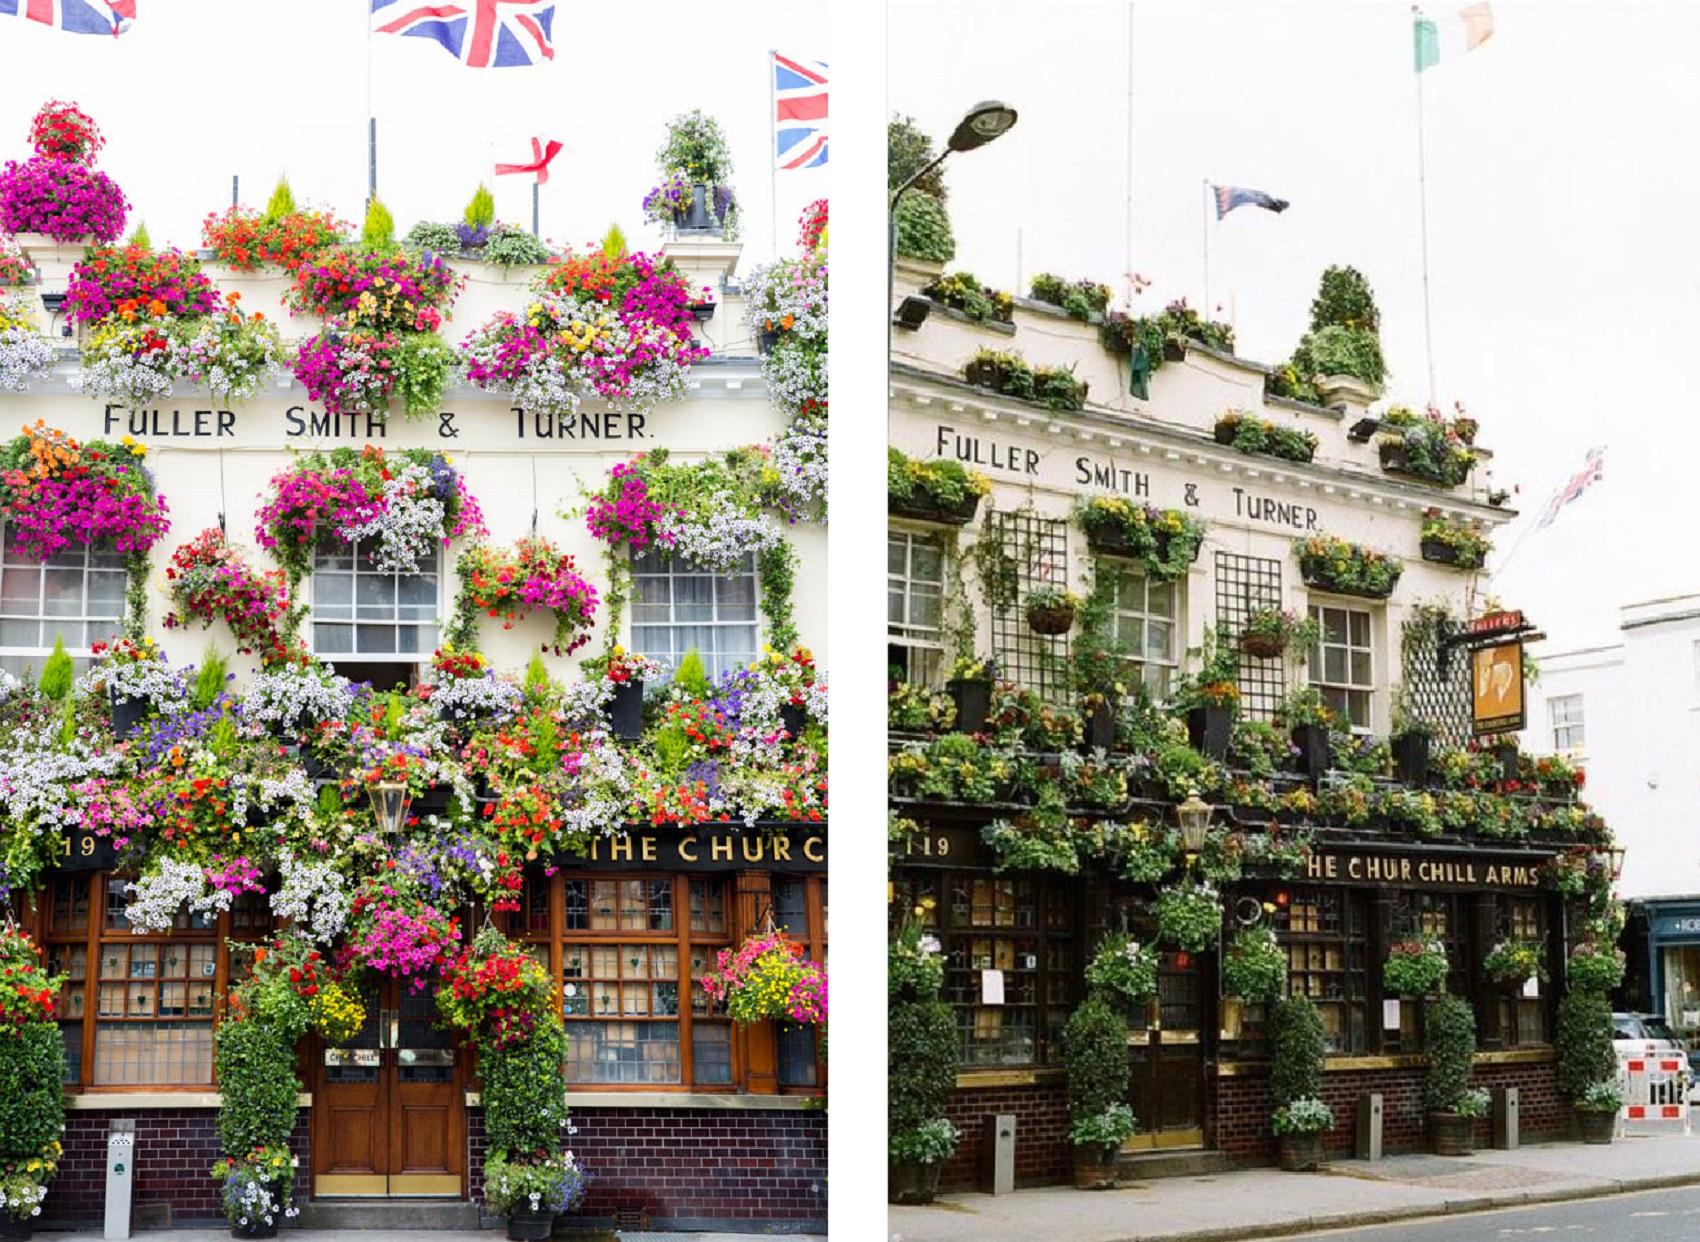 churchillarms-iconic-london-pub